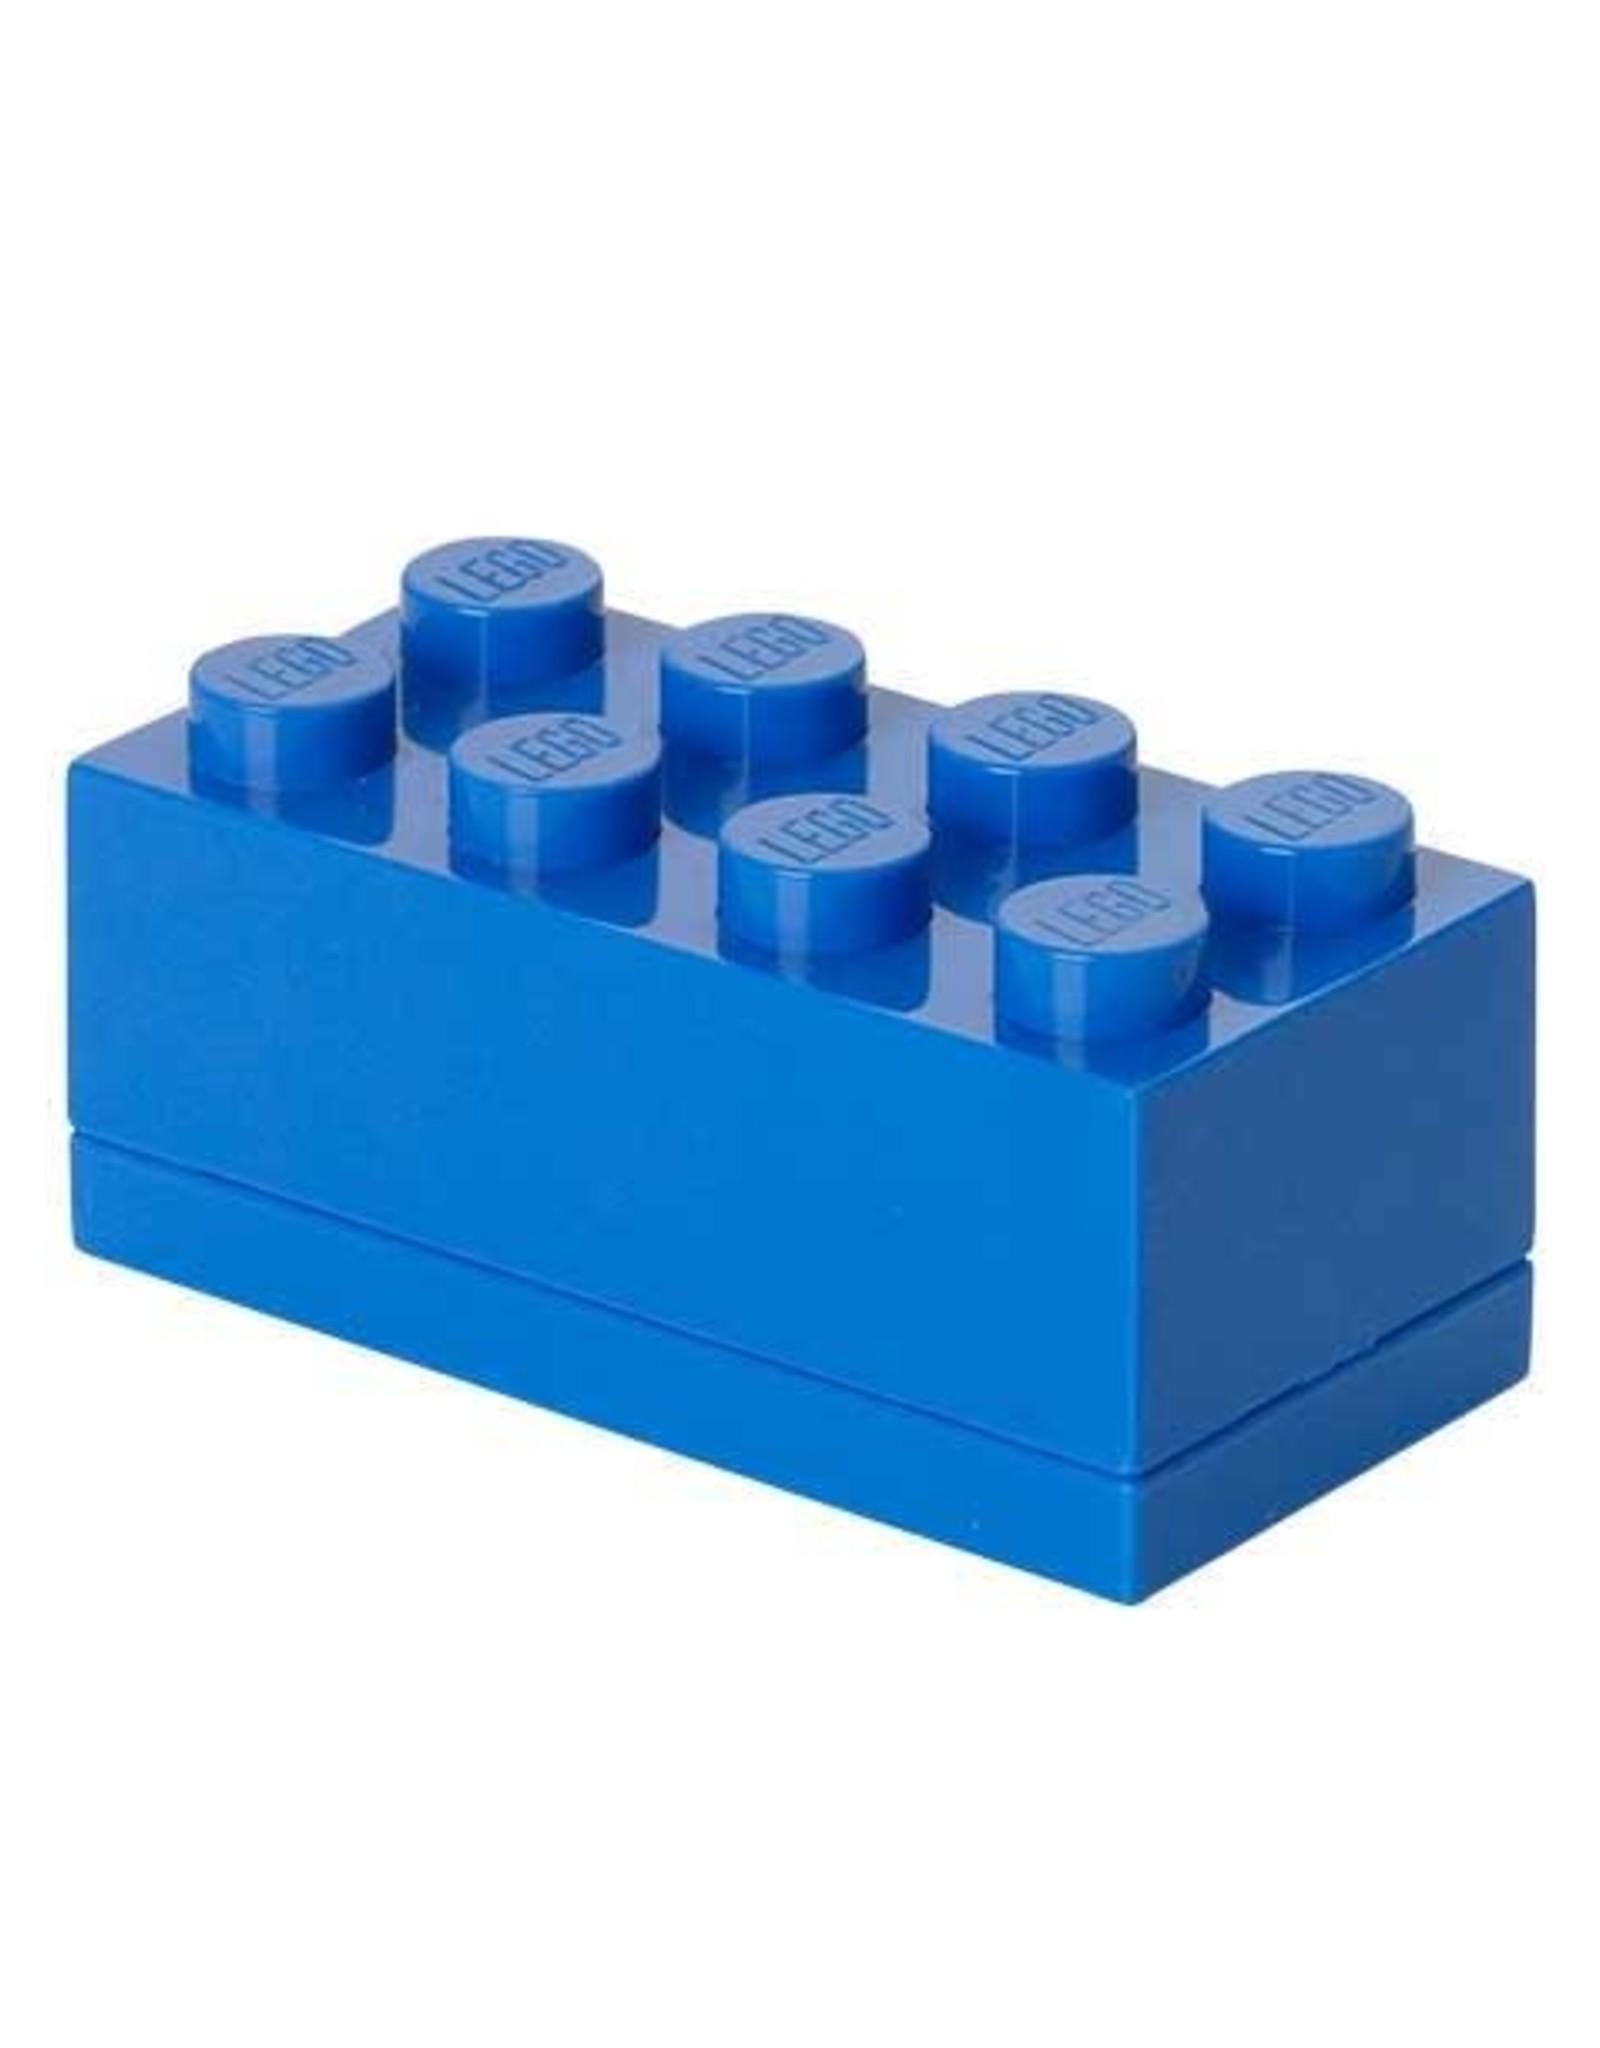 Lego Lego Storage Brick